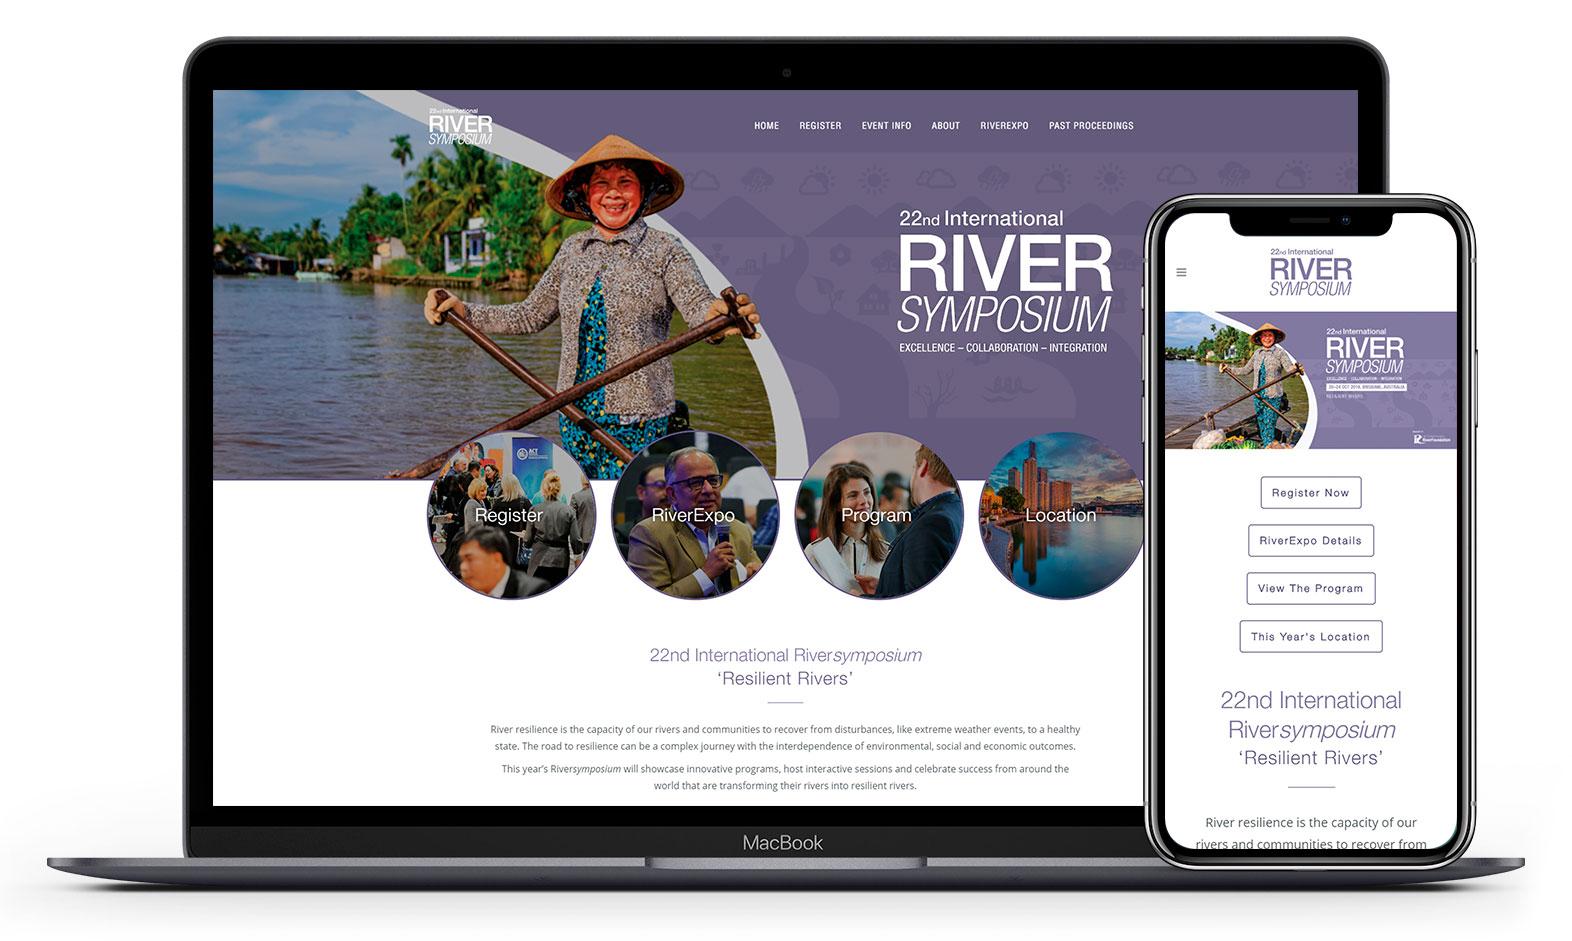 RiverSymposium's website design displayed responsive devices